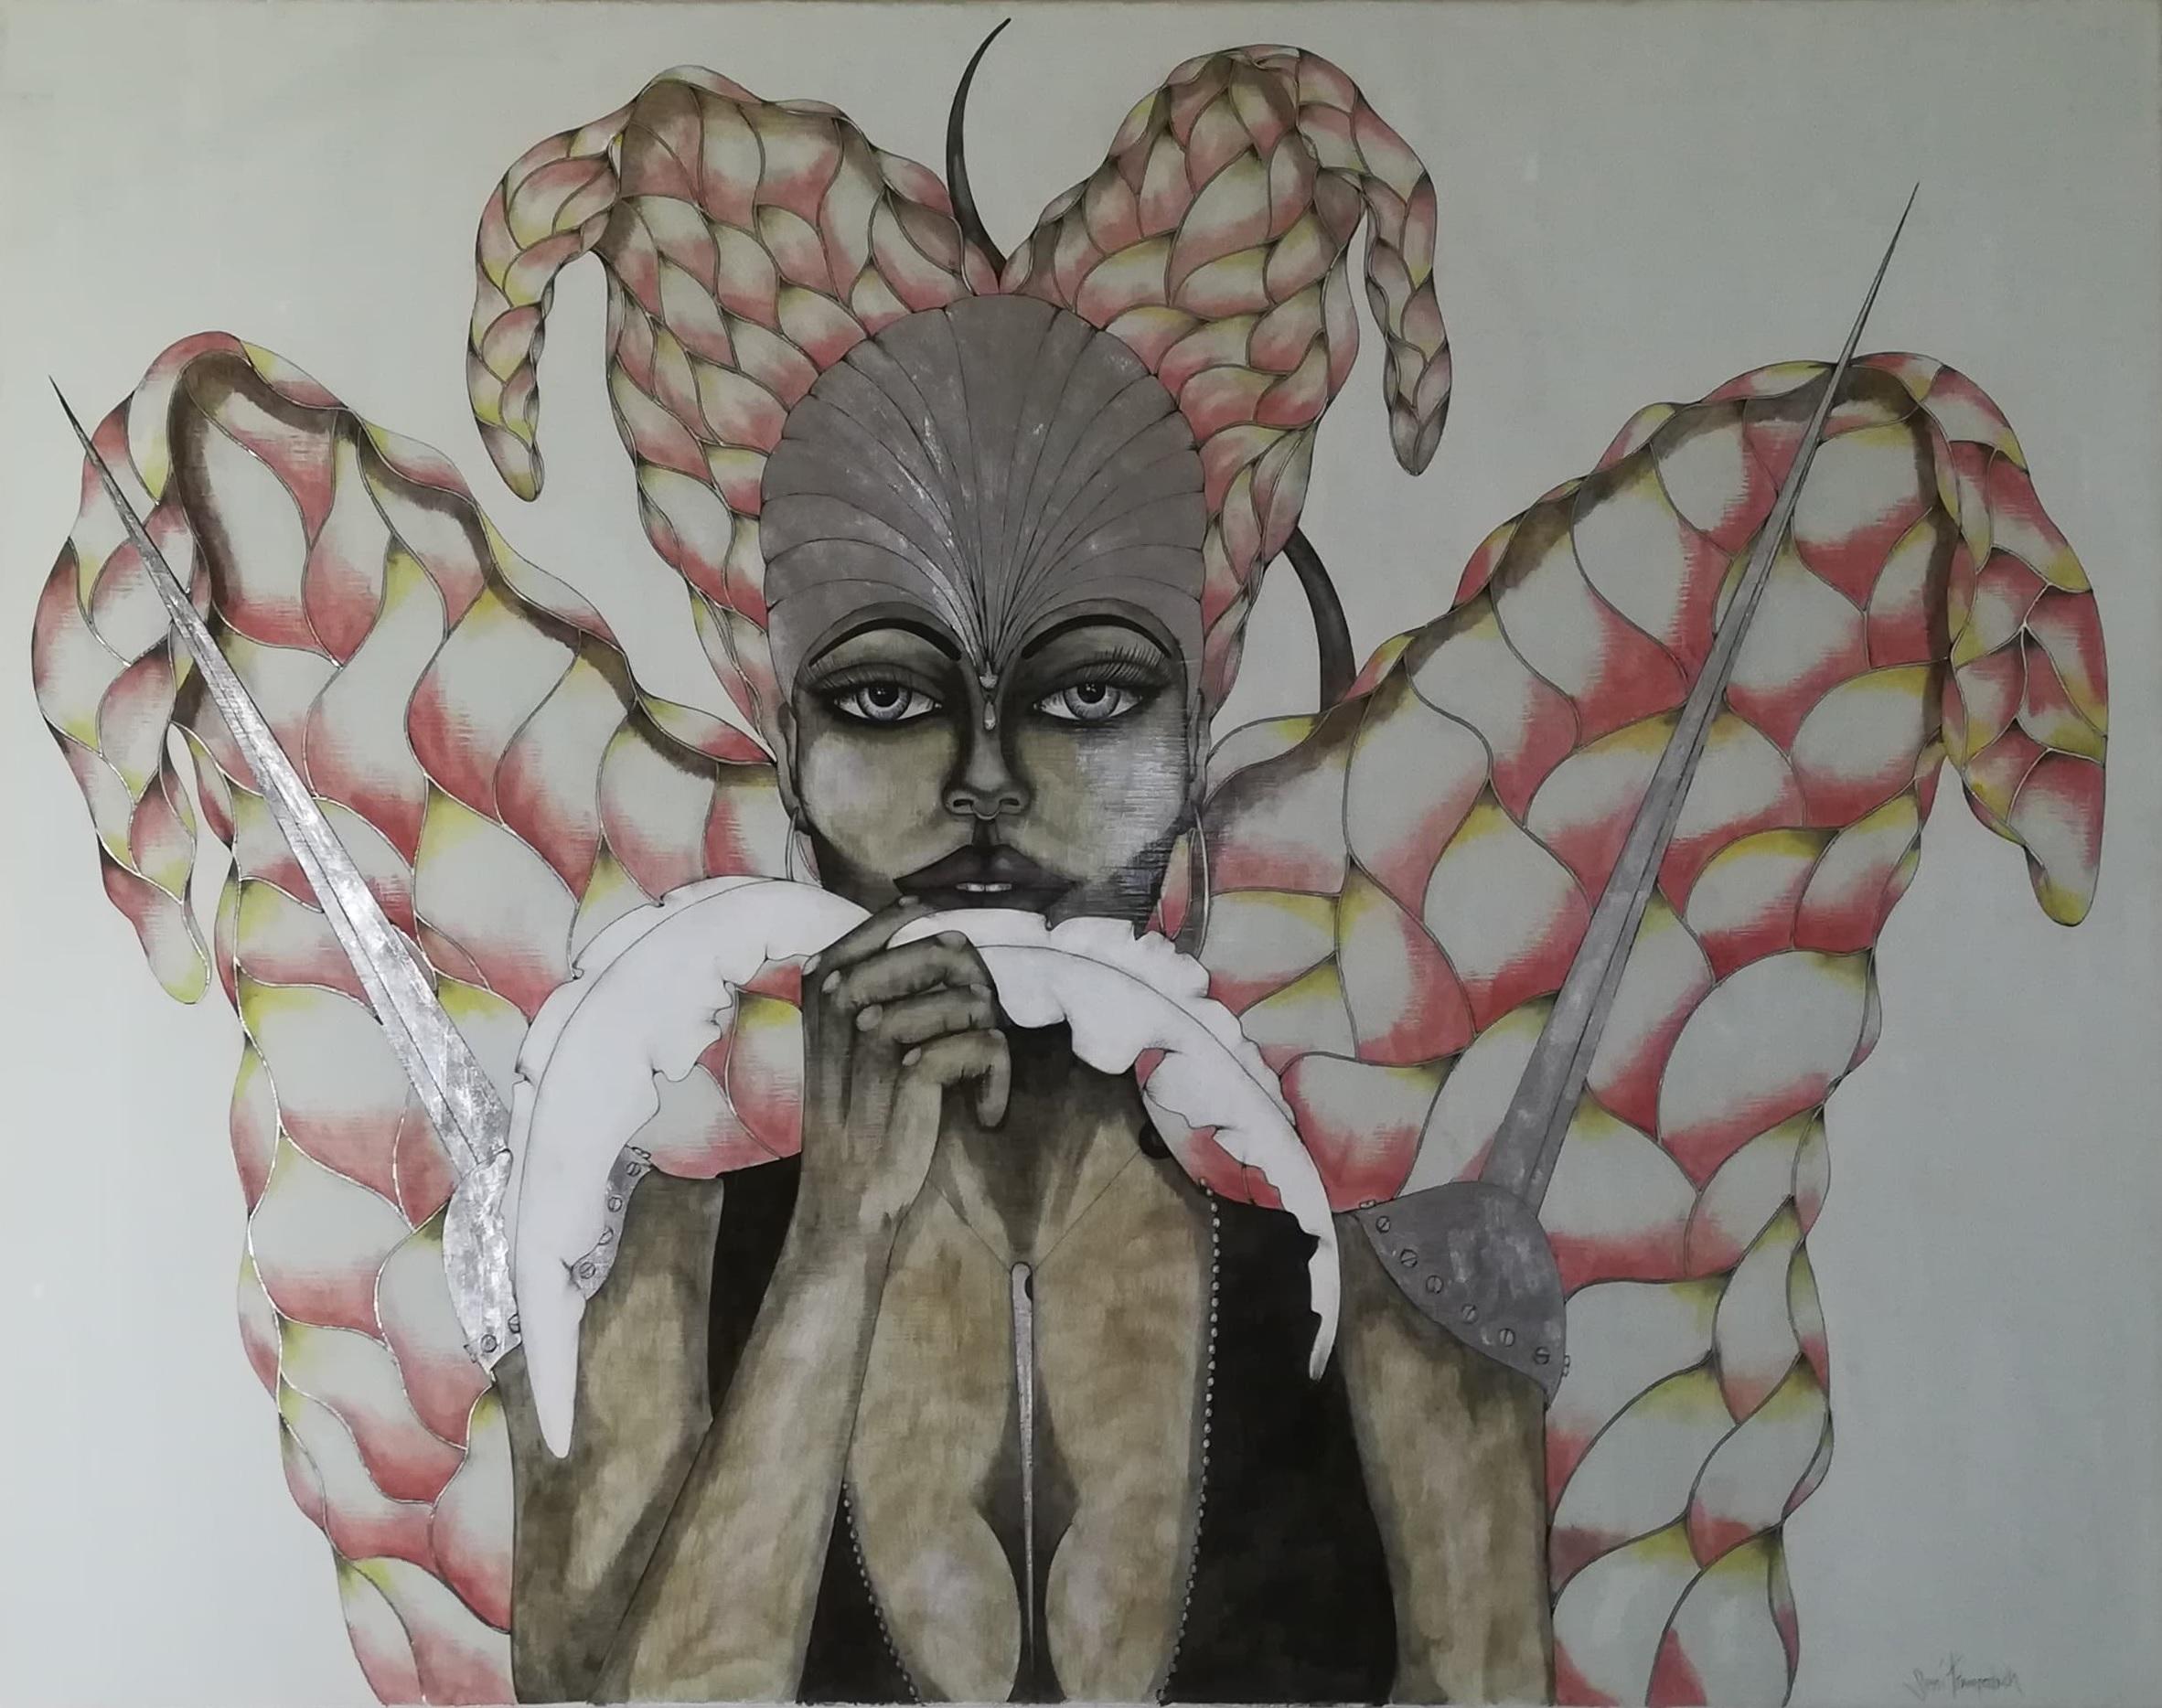 Billede af Sussi Trampedach maleri 7